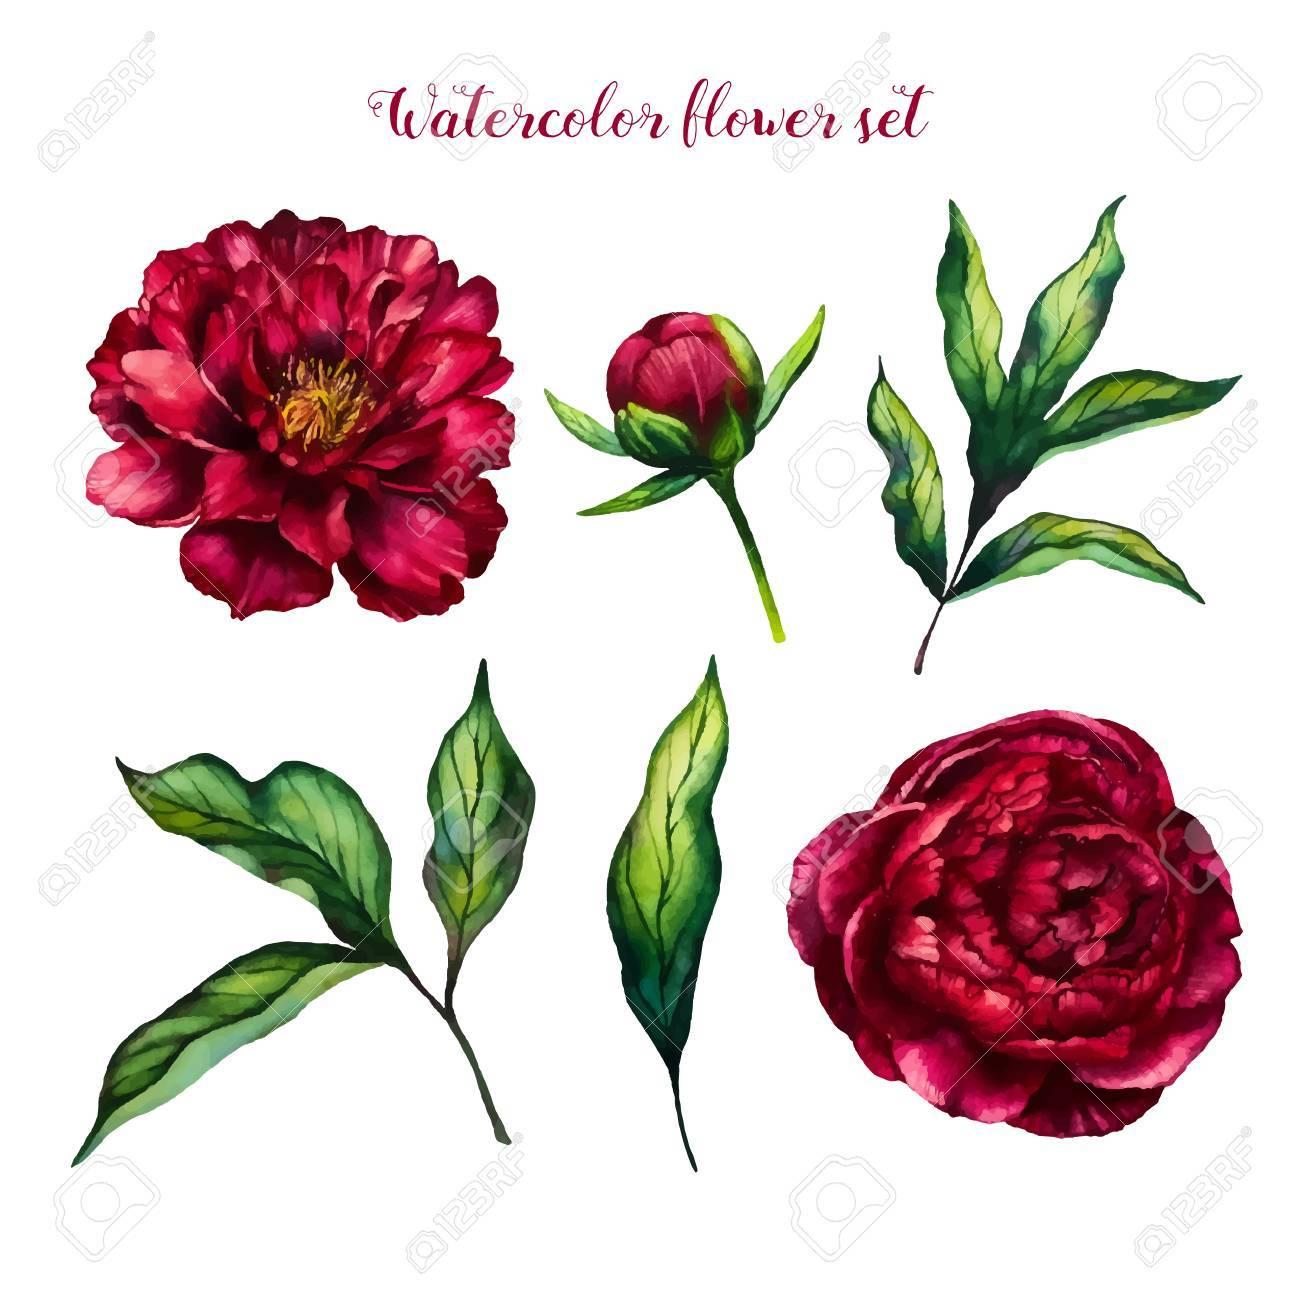 Watercolor Flower Peony, Flowers And Leaves Peonies, Watercolor Rose ...